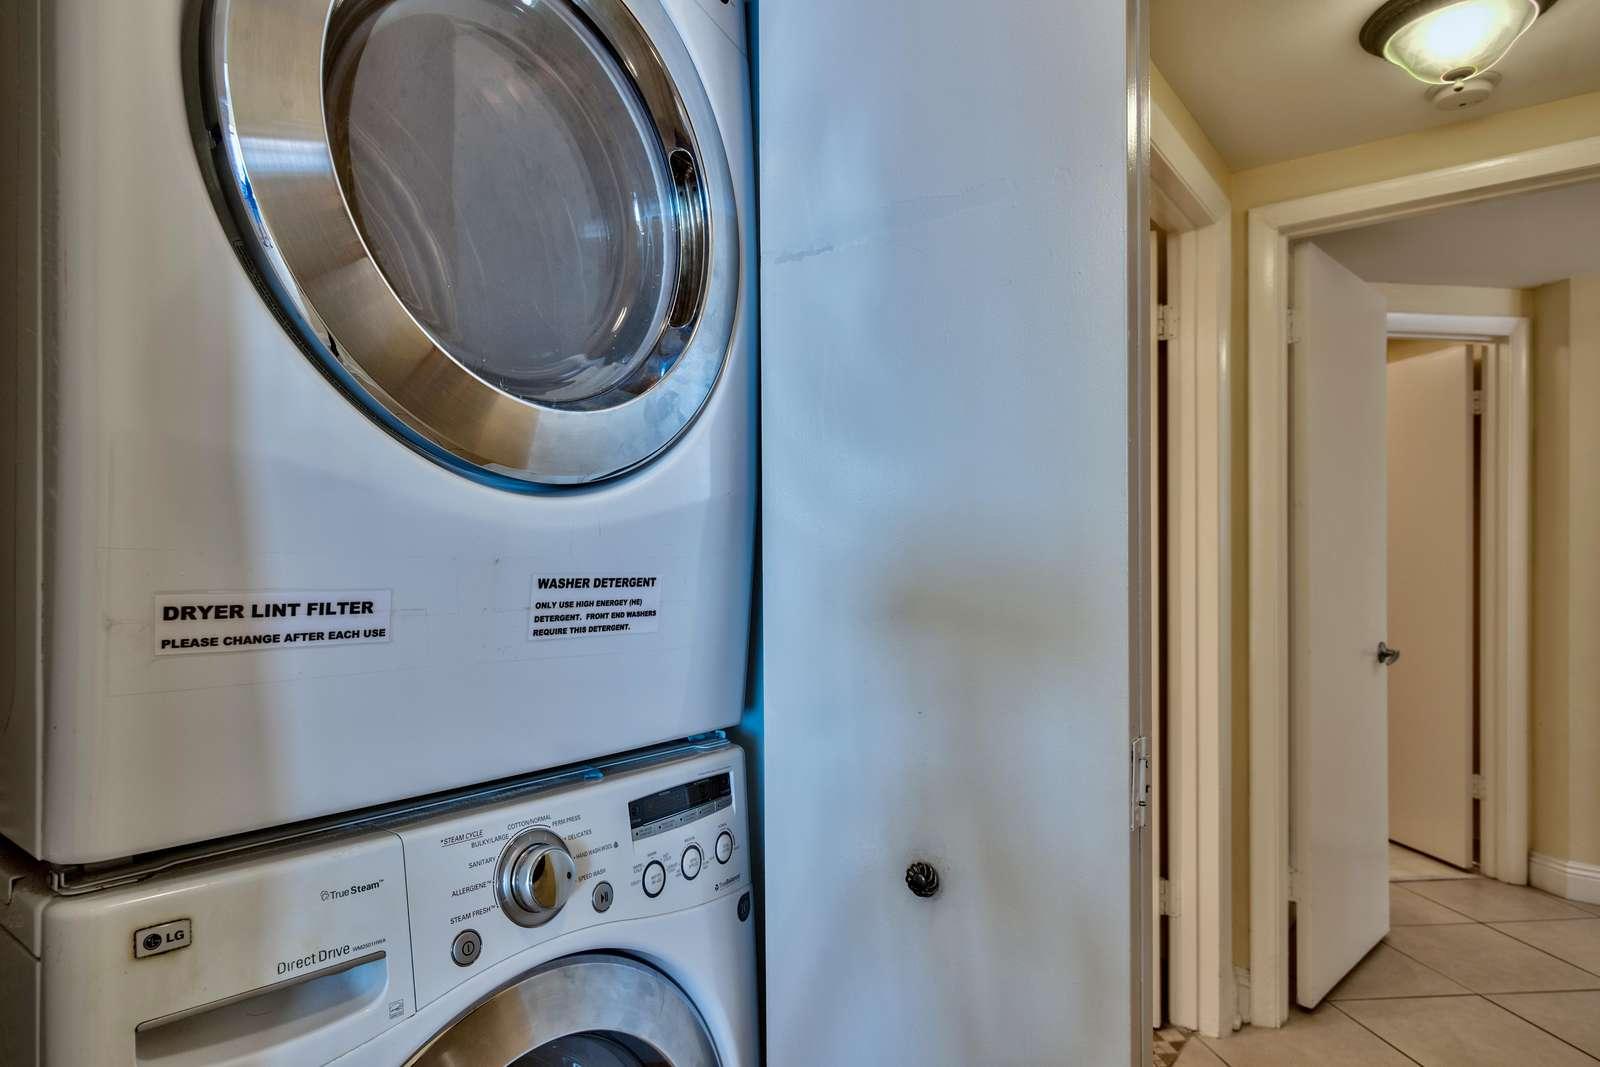 Full Wash/Dryer